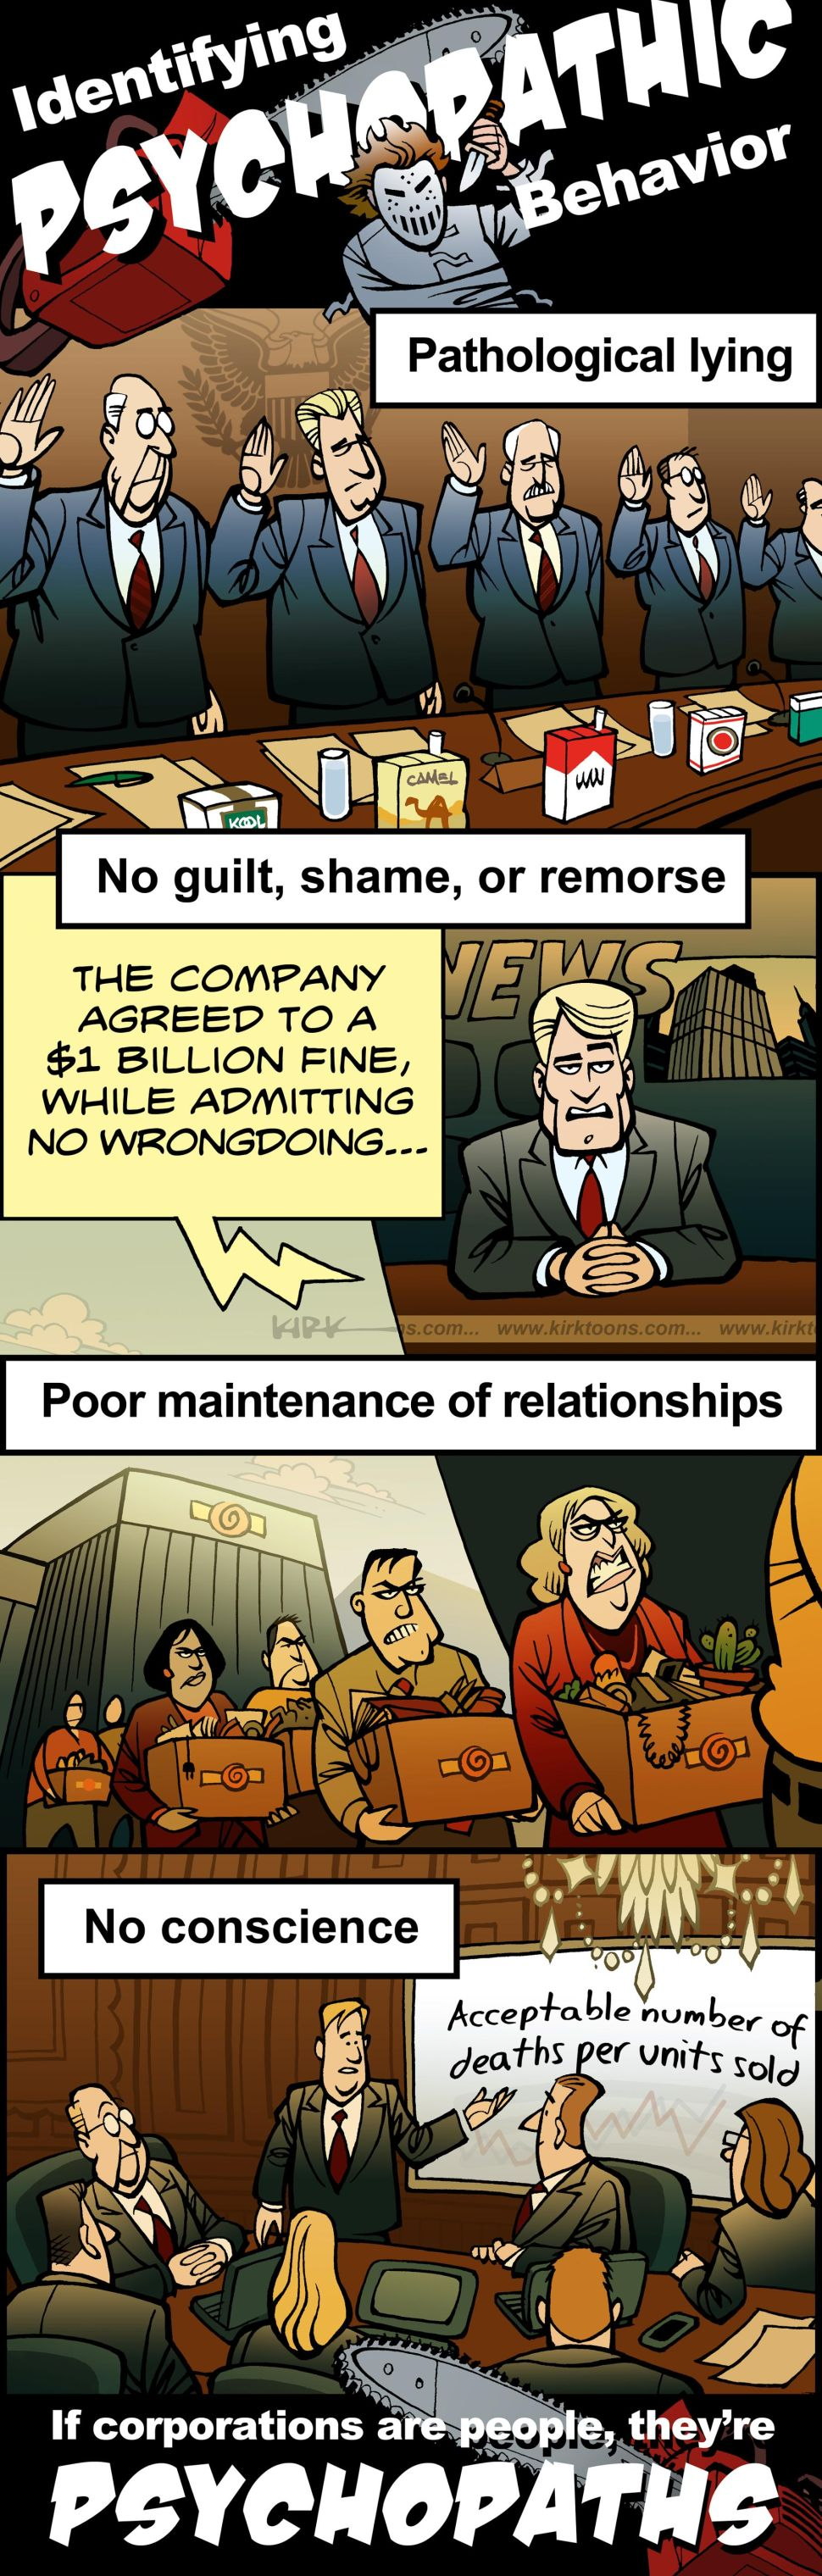 Here's How to Explain Corporate Behavior